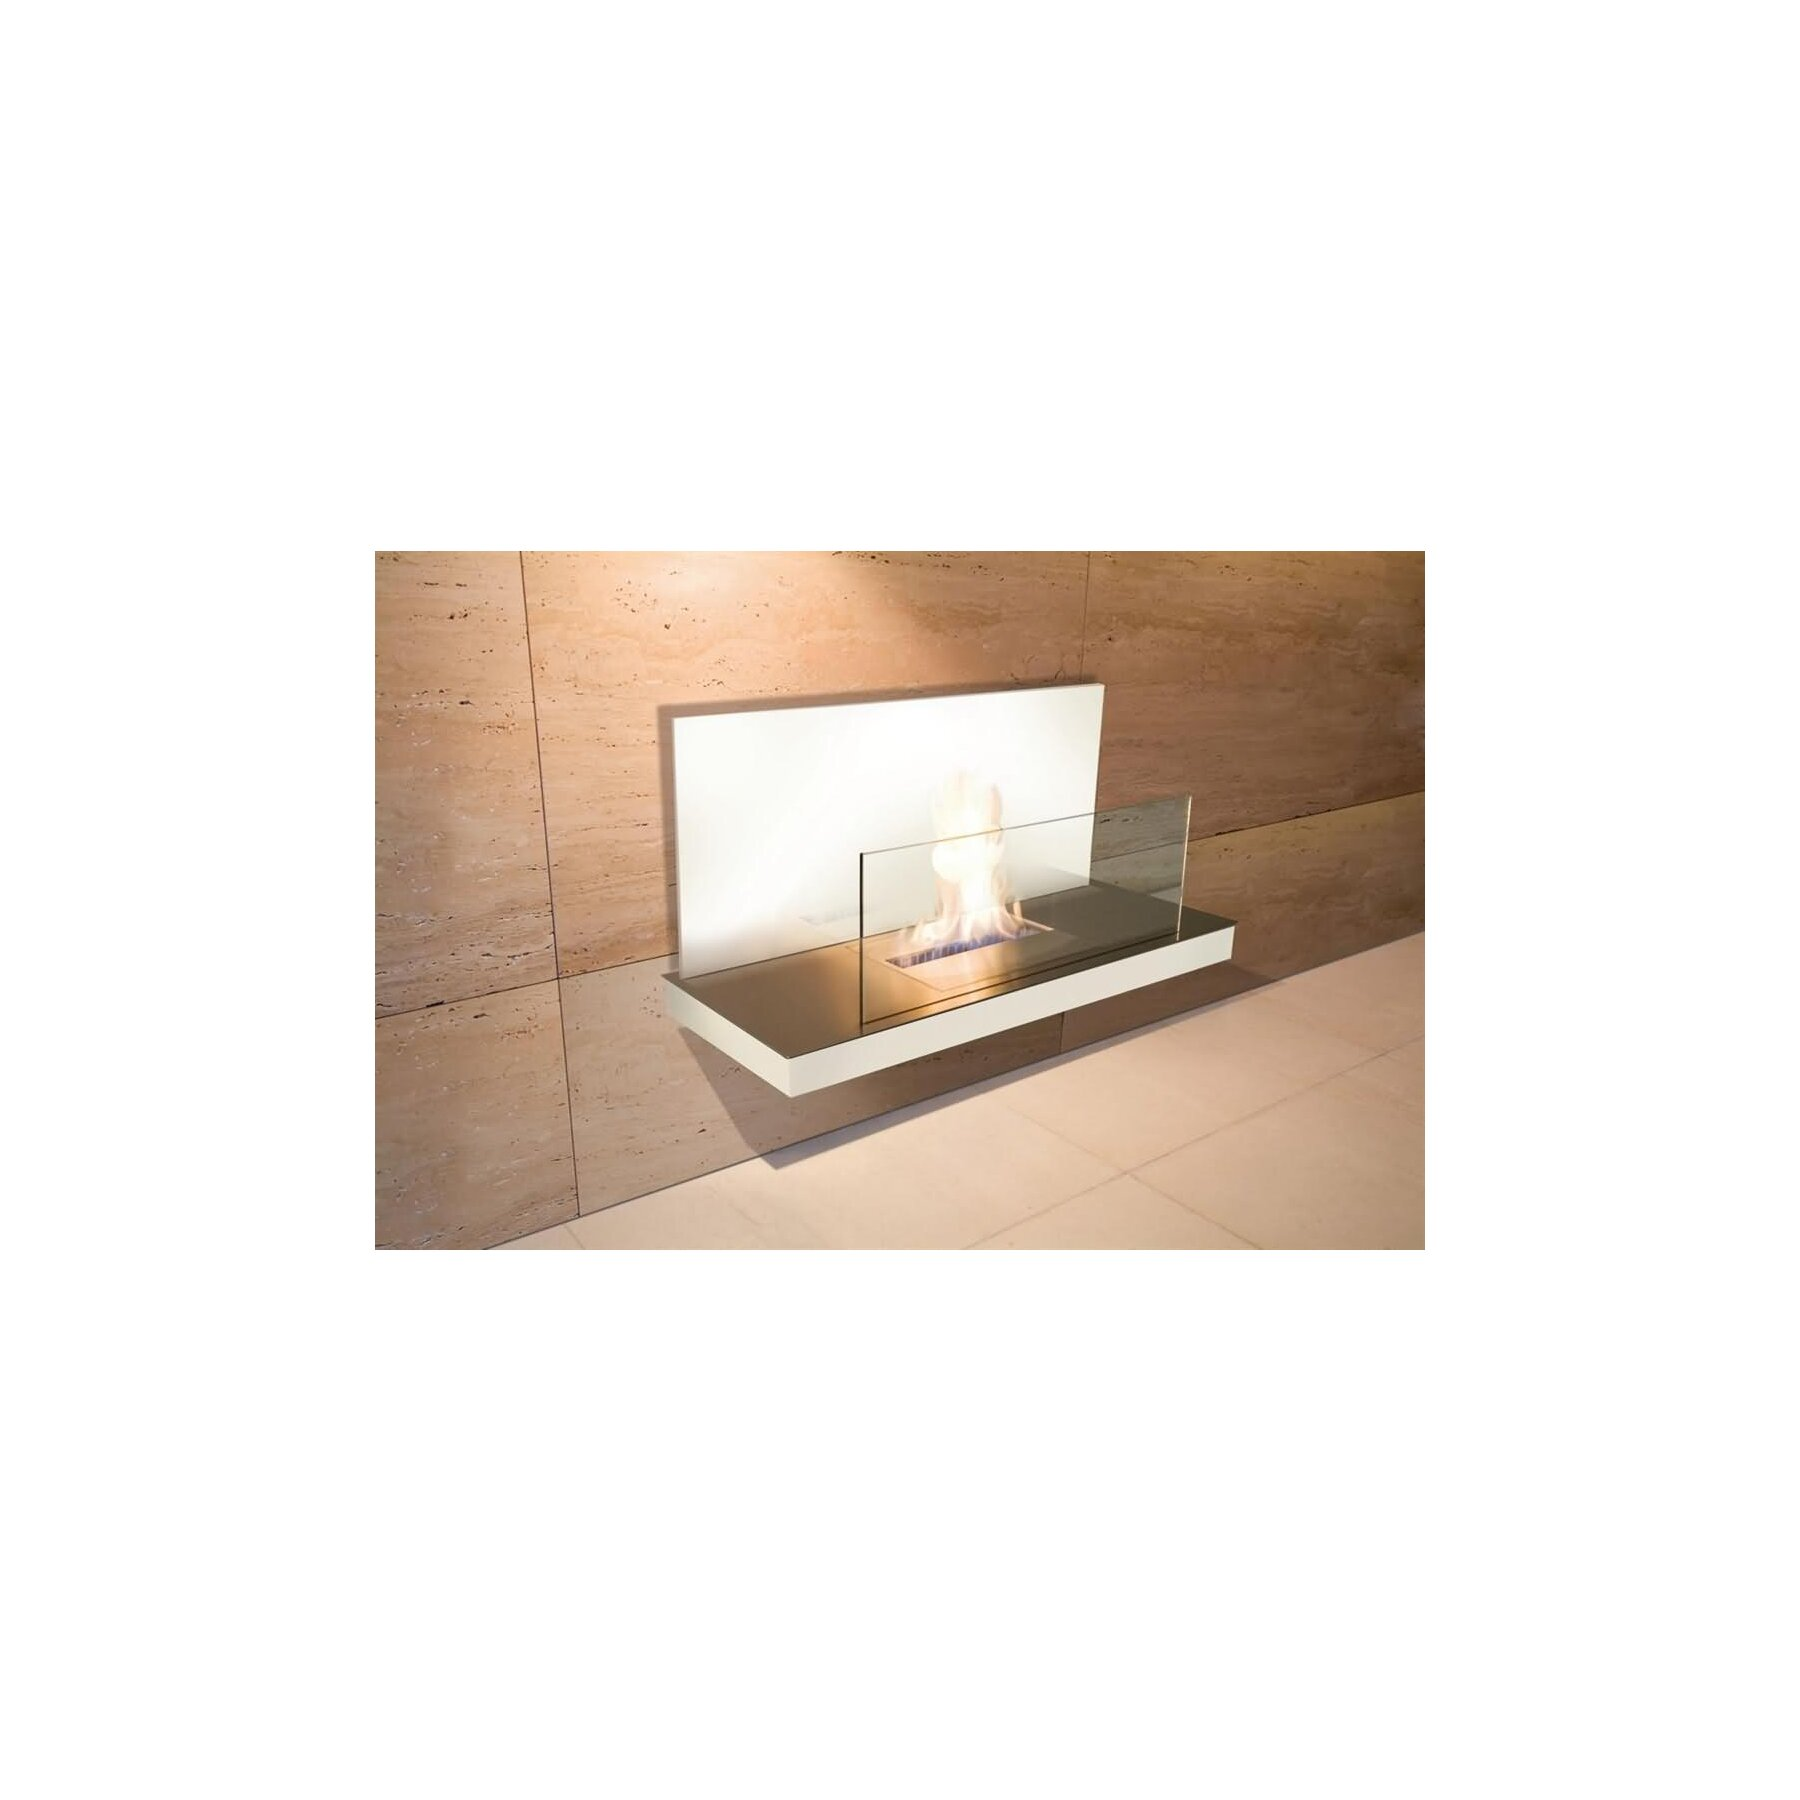 86 wall flame i wandkamin wall flame 1 kamin. Black Bedroom Furniture Sets. Home Design Ideas